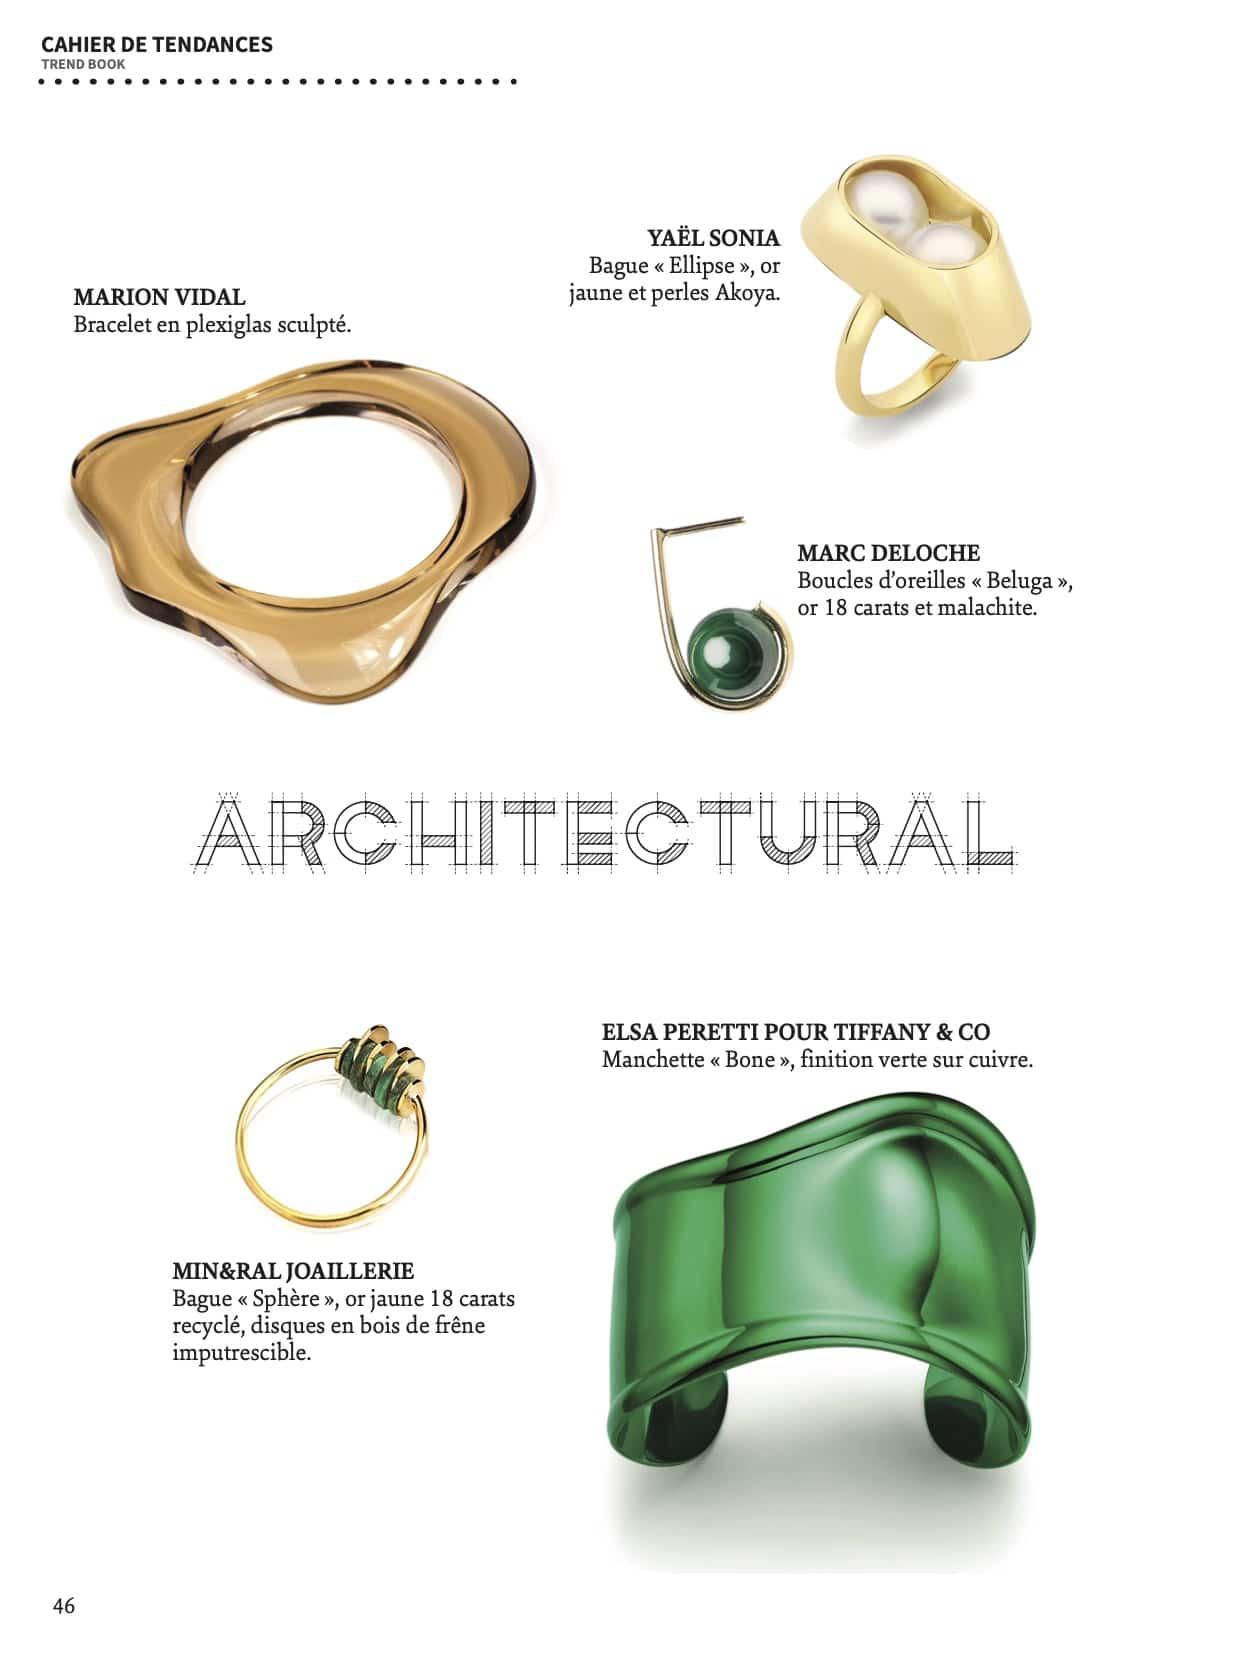 Le bijoutier international salon mineral joaillerie